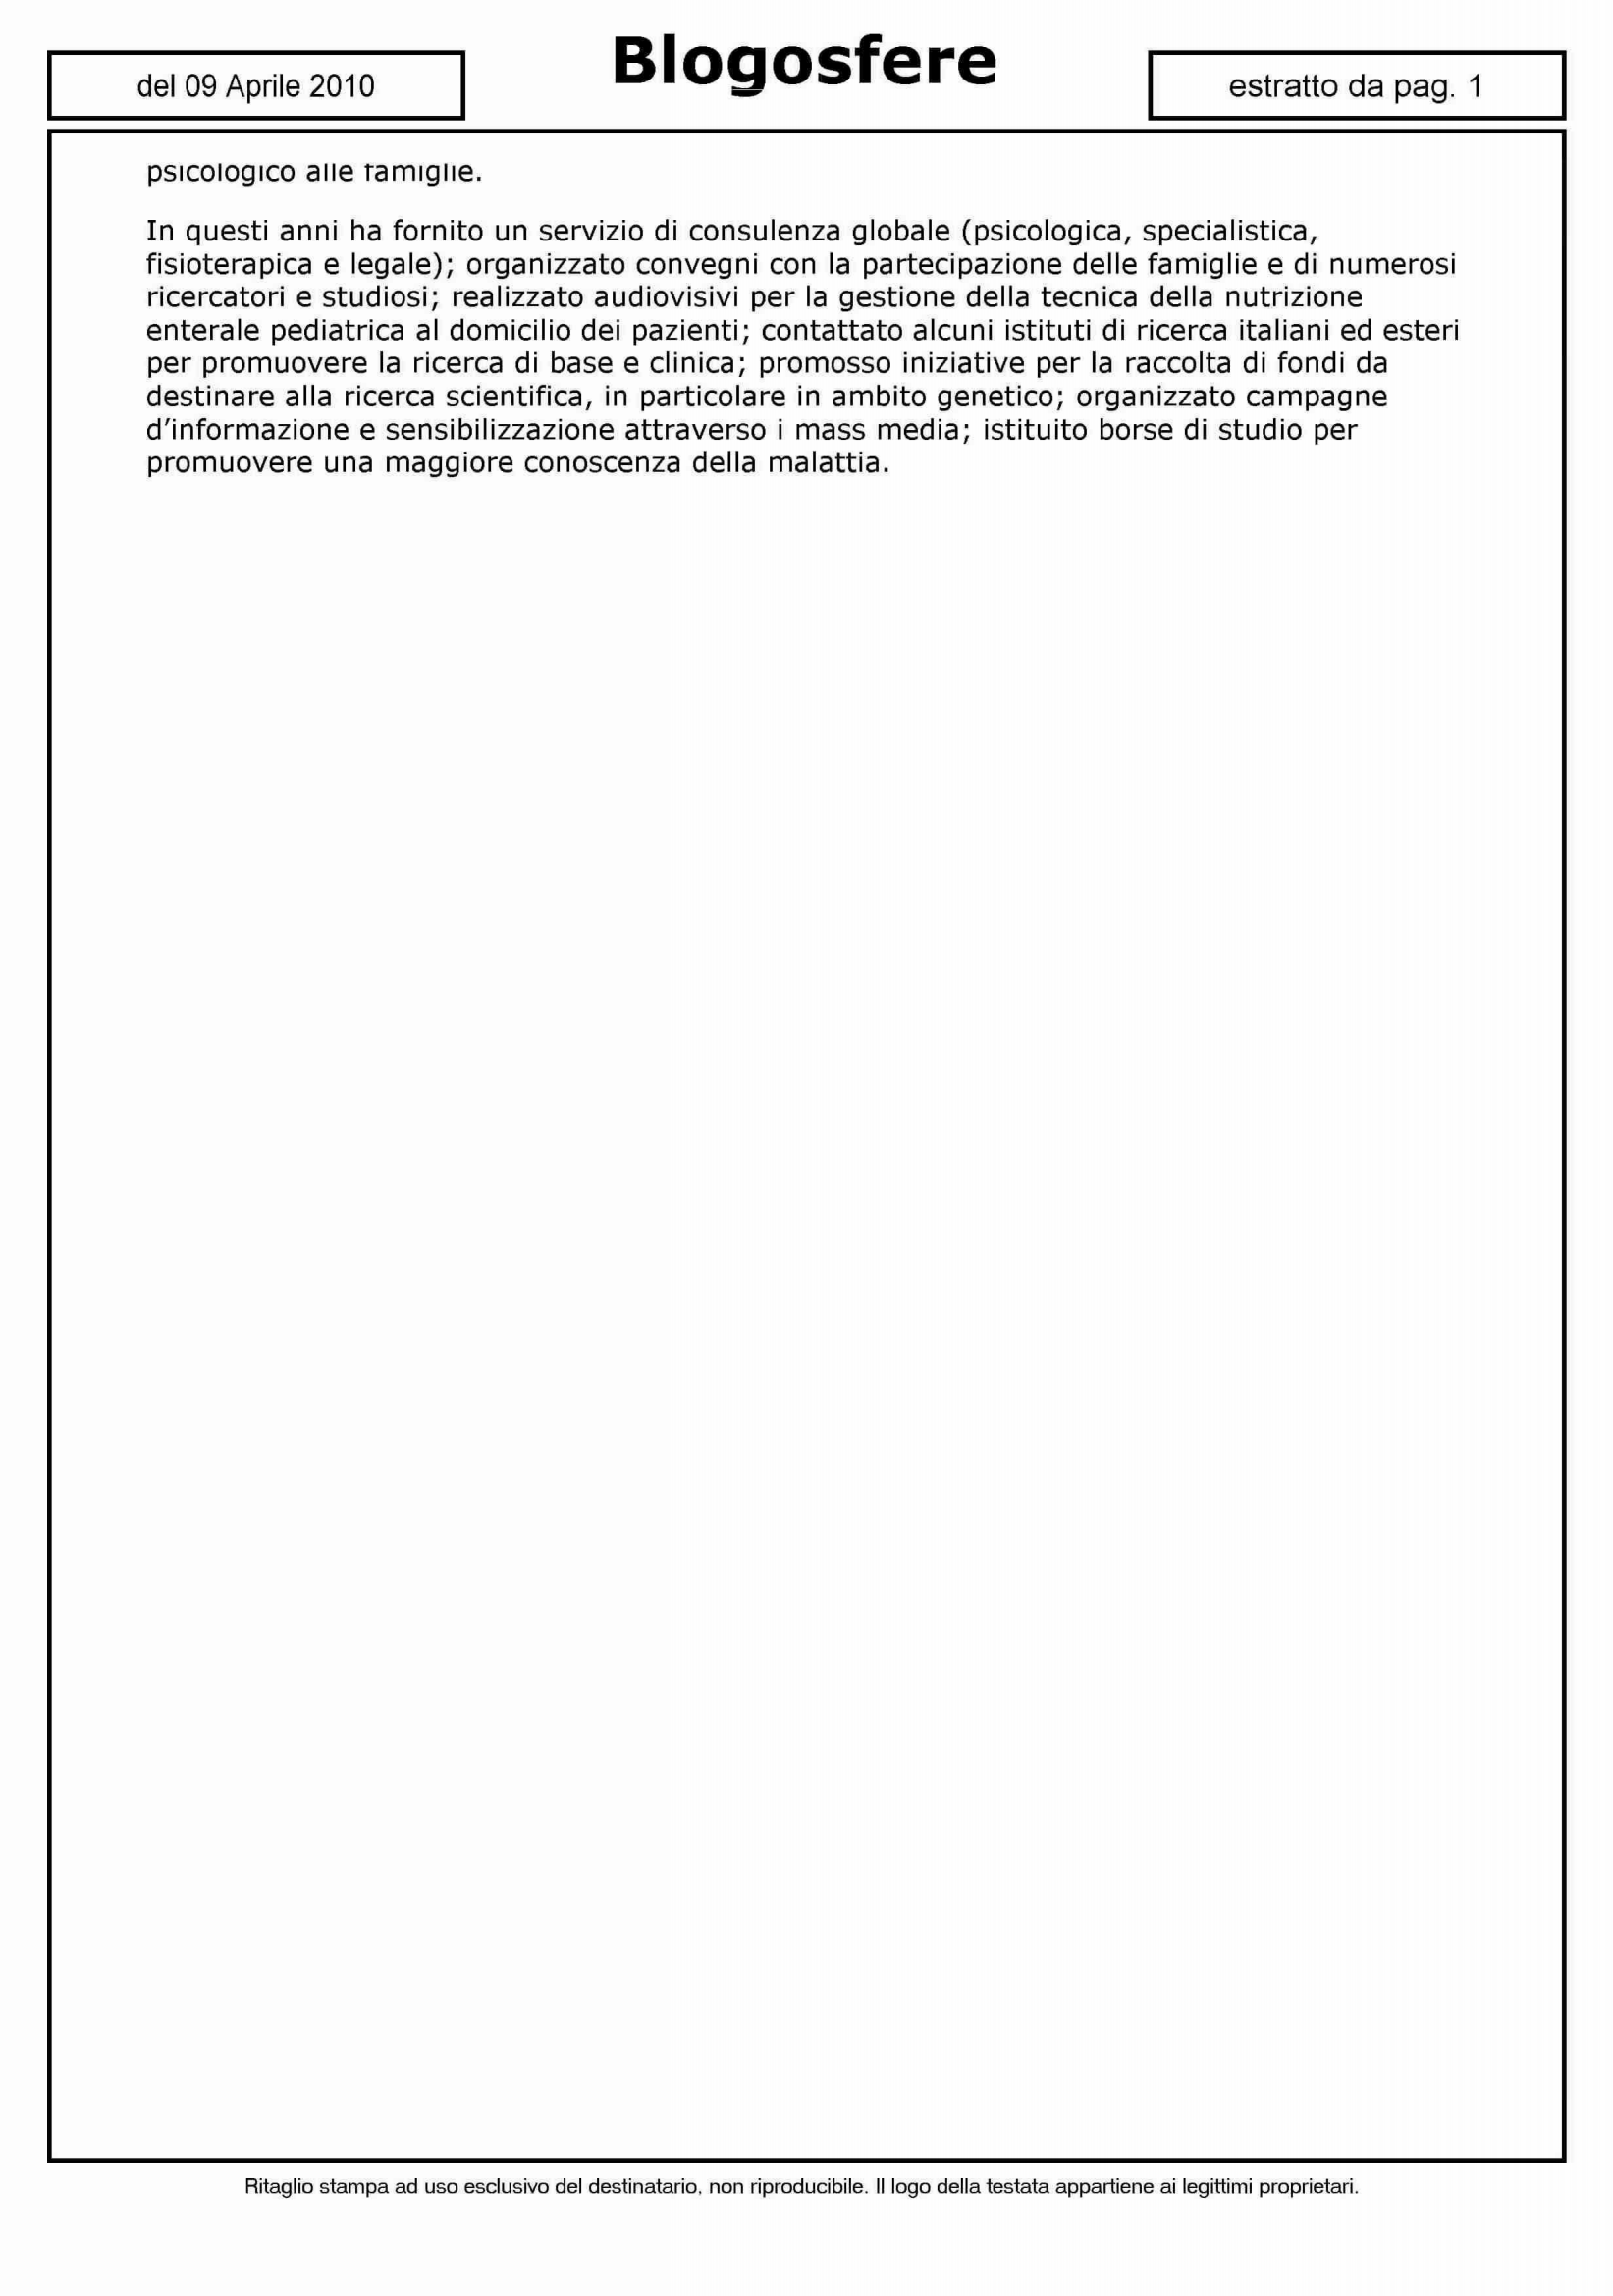 Stampa_20100422_misure straordinarie_Page_61